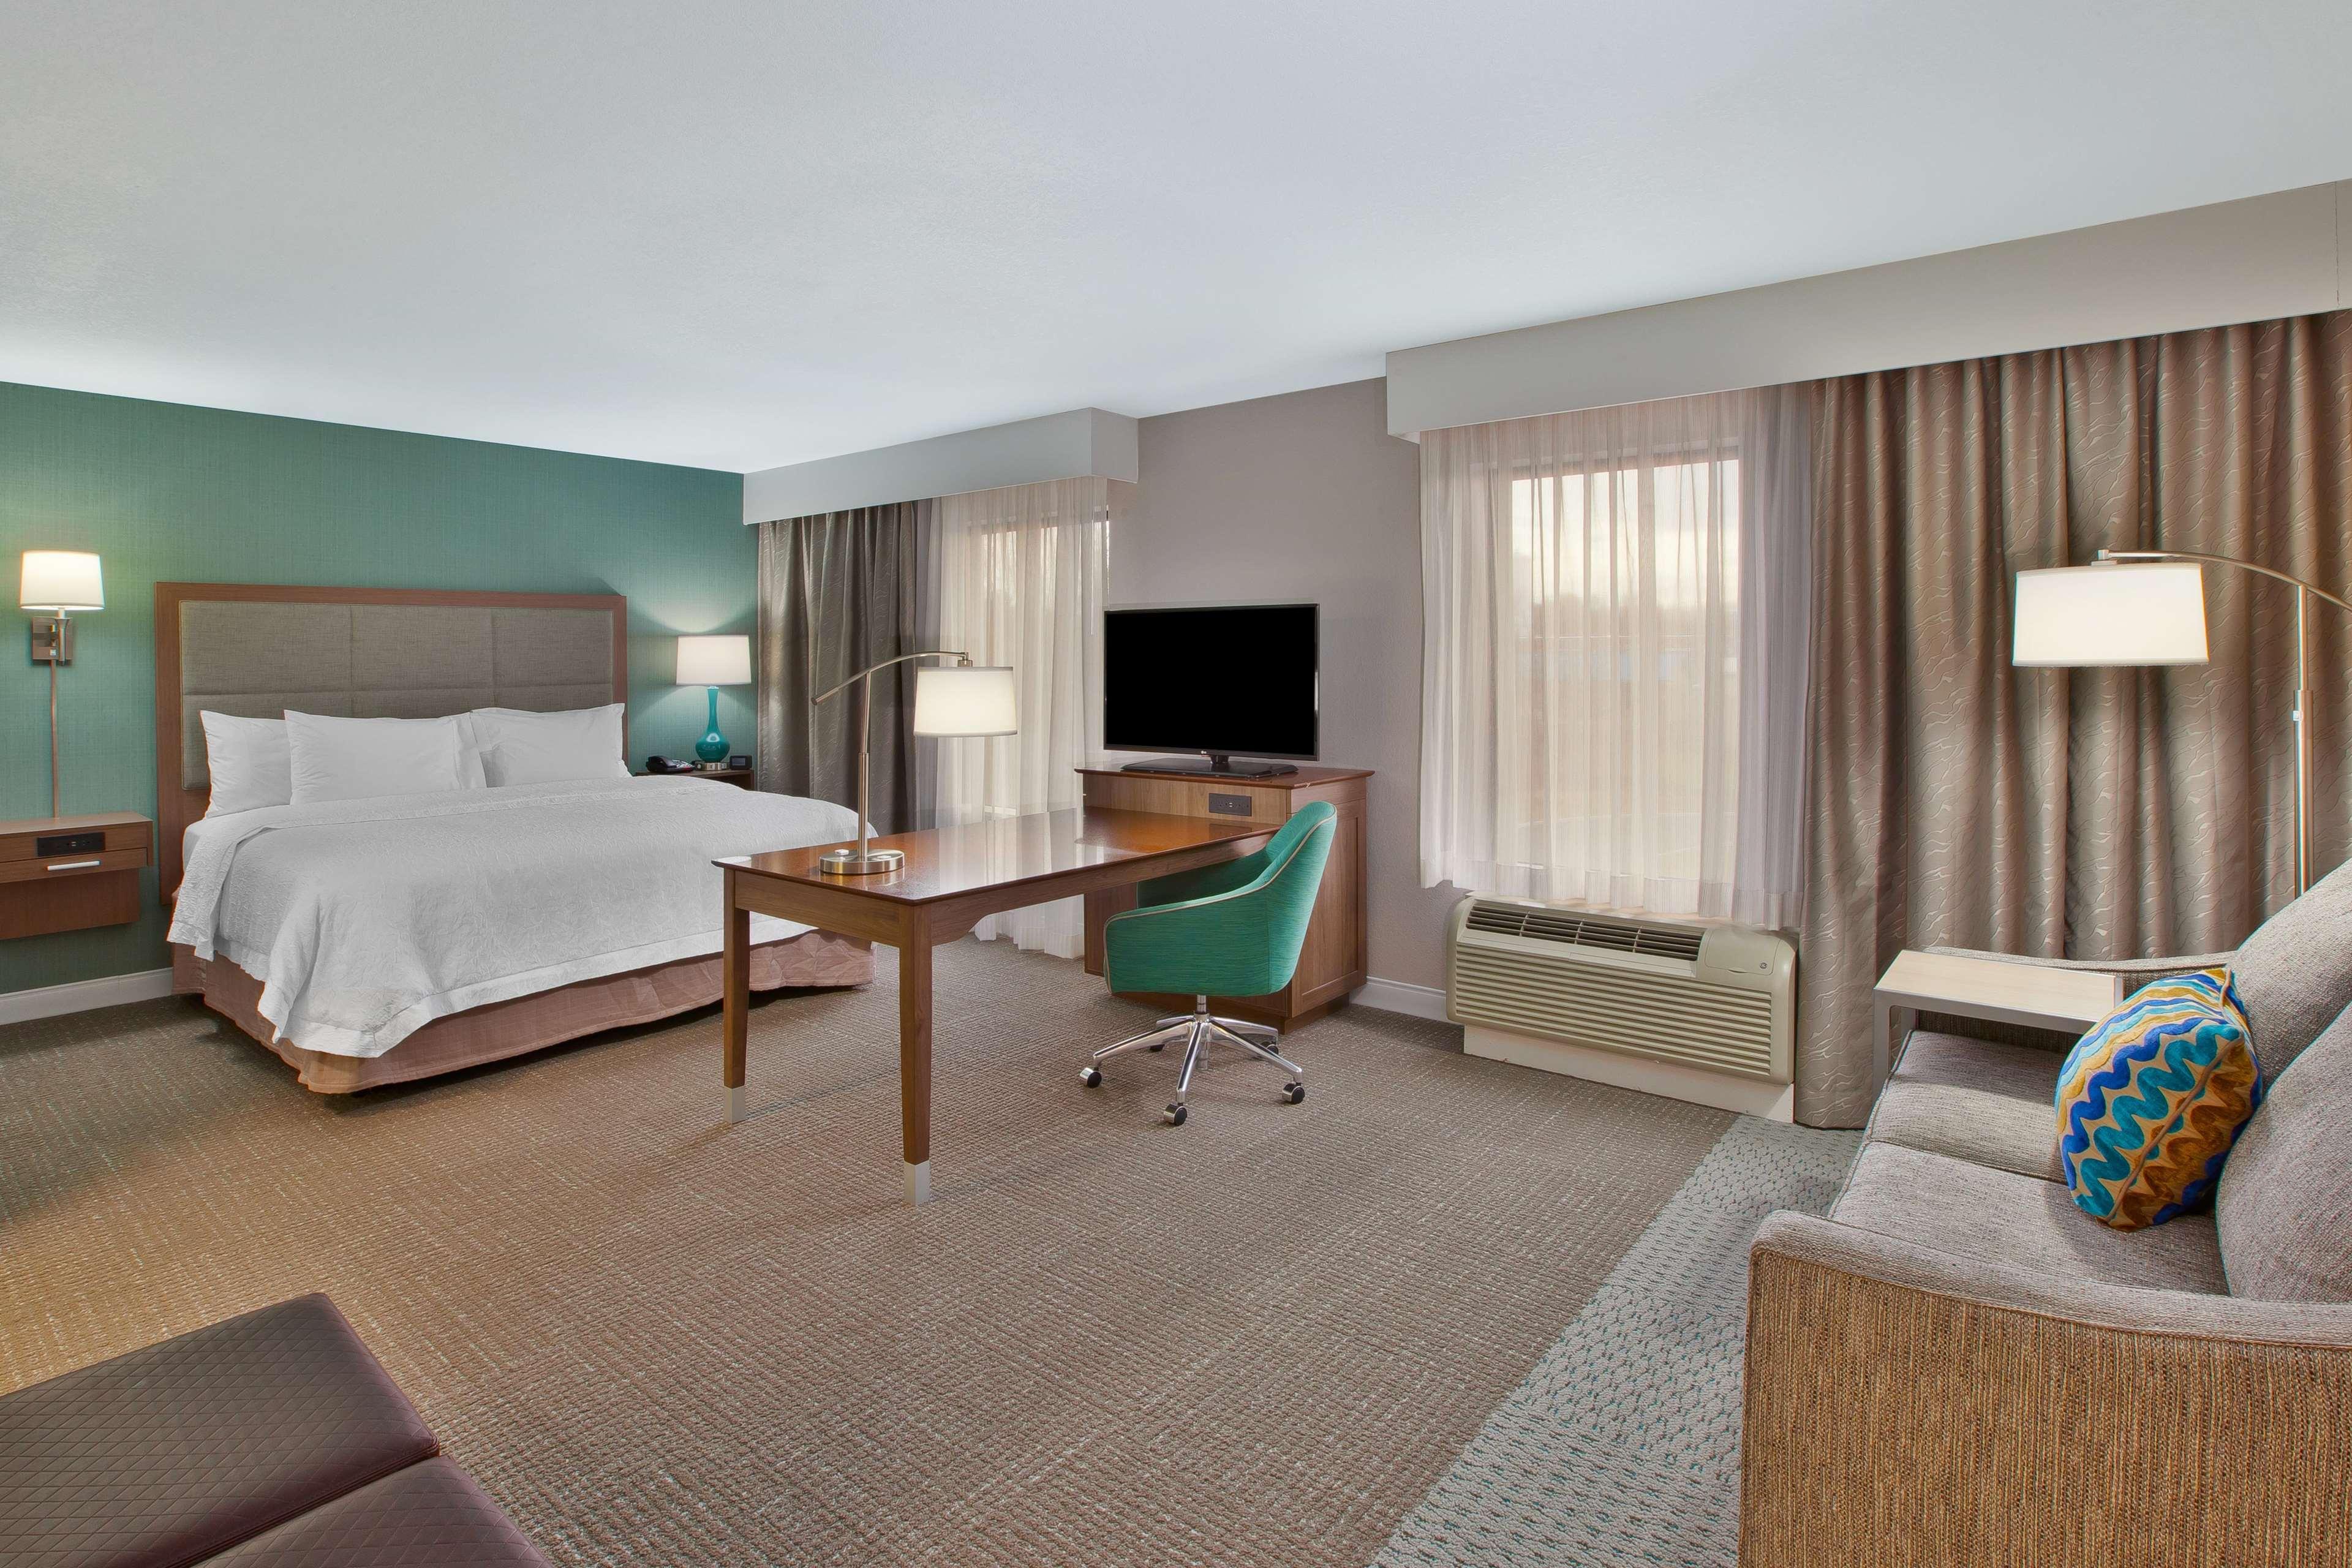 Hampton Inn & Suites Alliance image 15